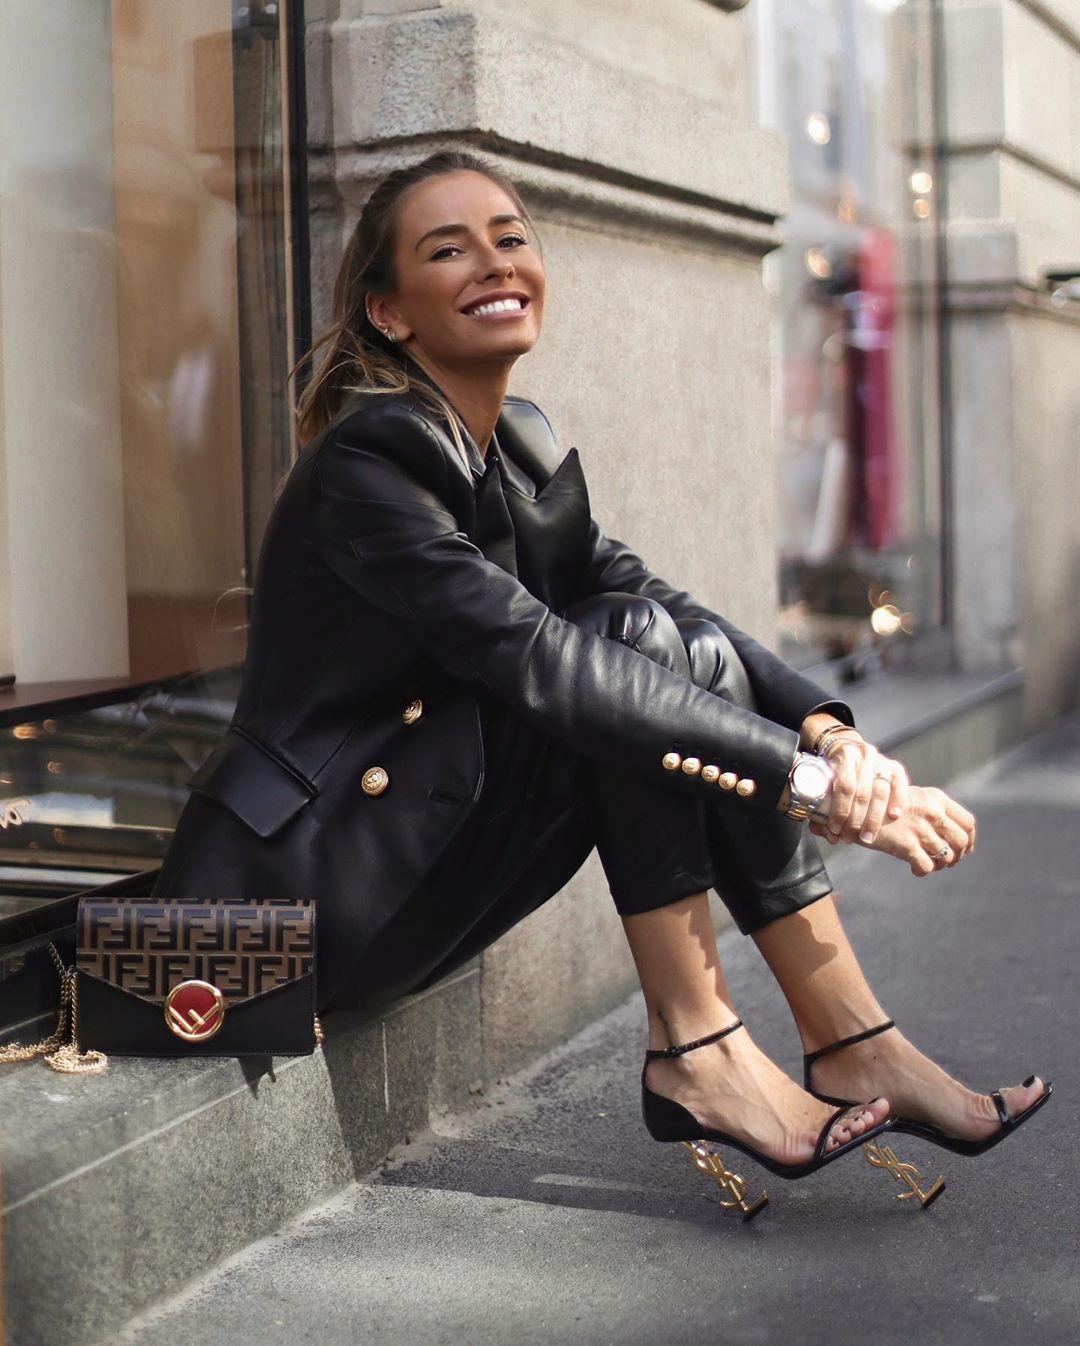 synthetic leather cargo pants de Zara sur martacarriedo